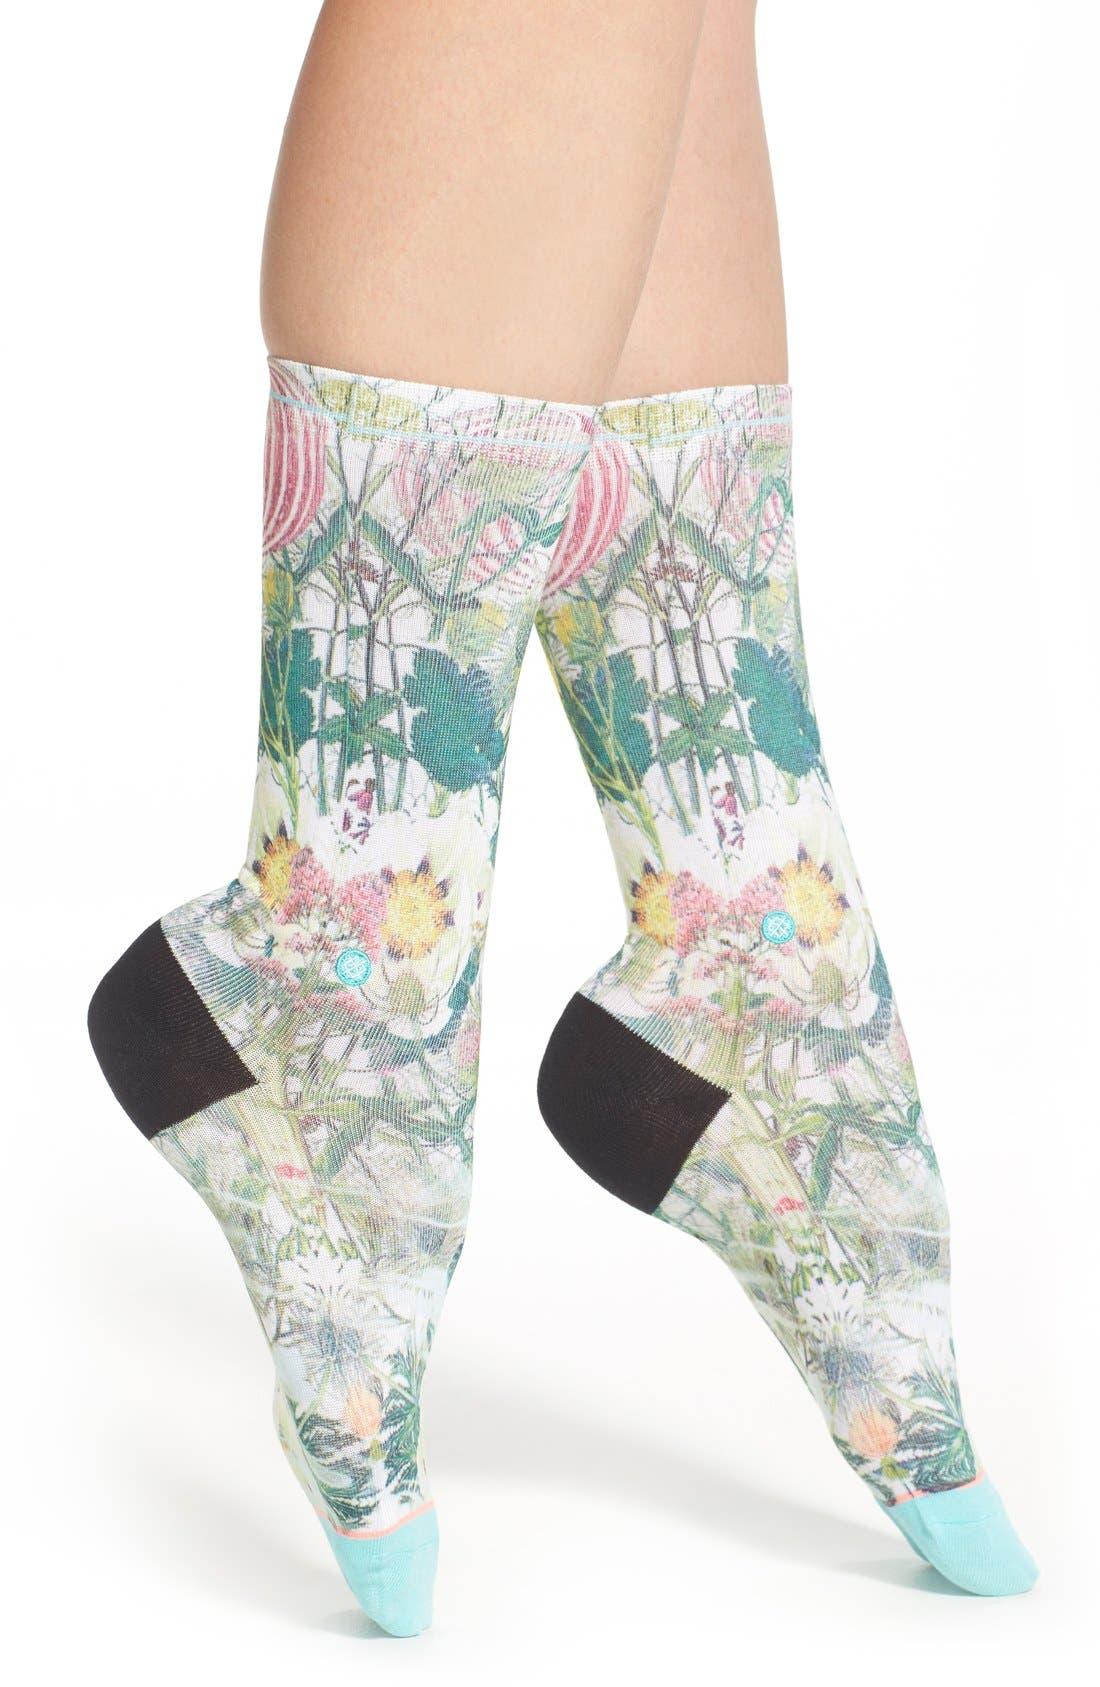 Alternate Image 1 Selected - Stance 'Chaotic Flower' Socks